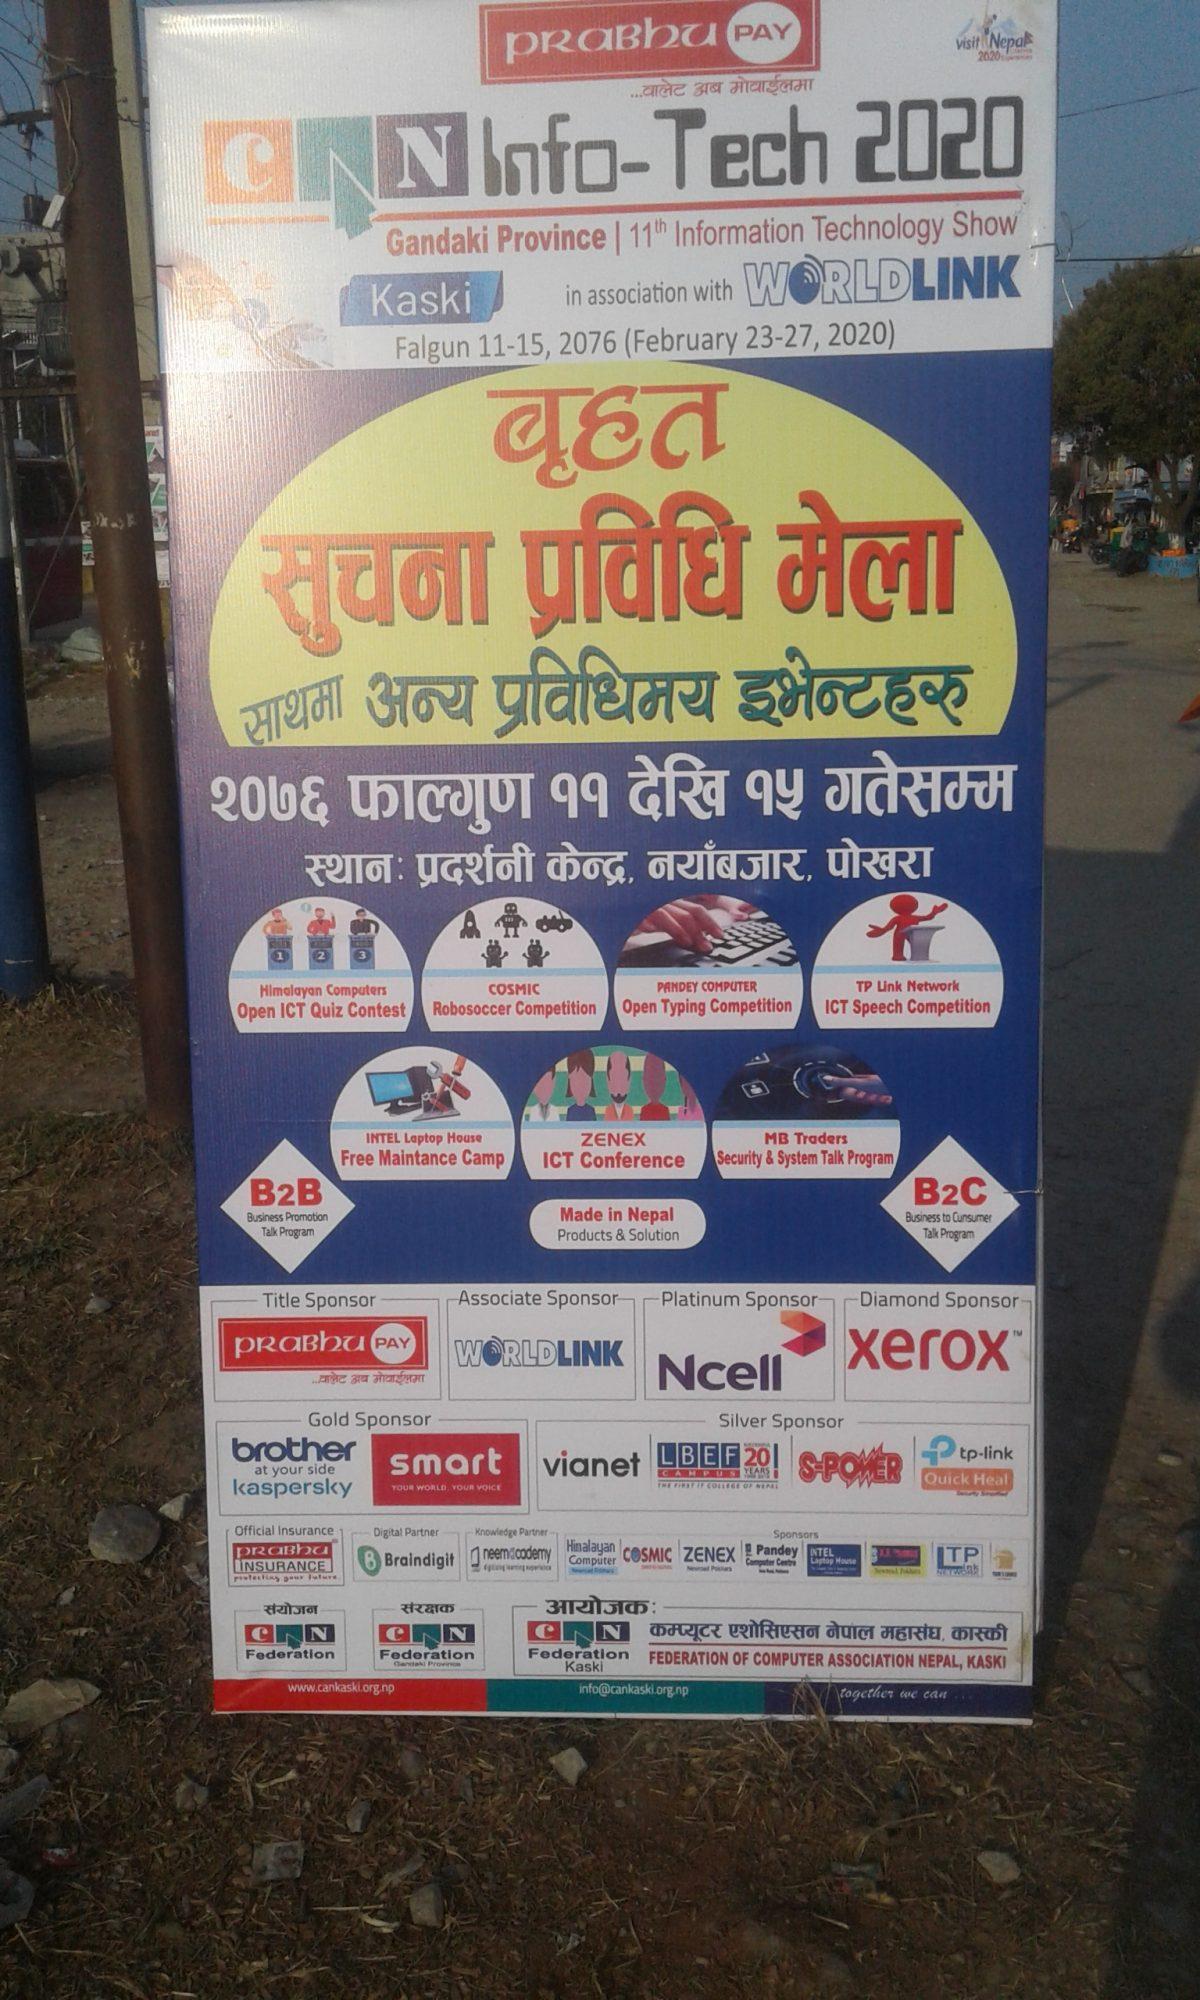 CAN info Tech pokhara 2020